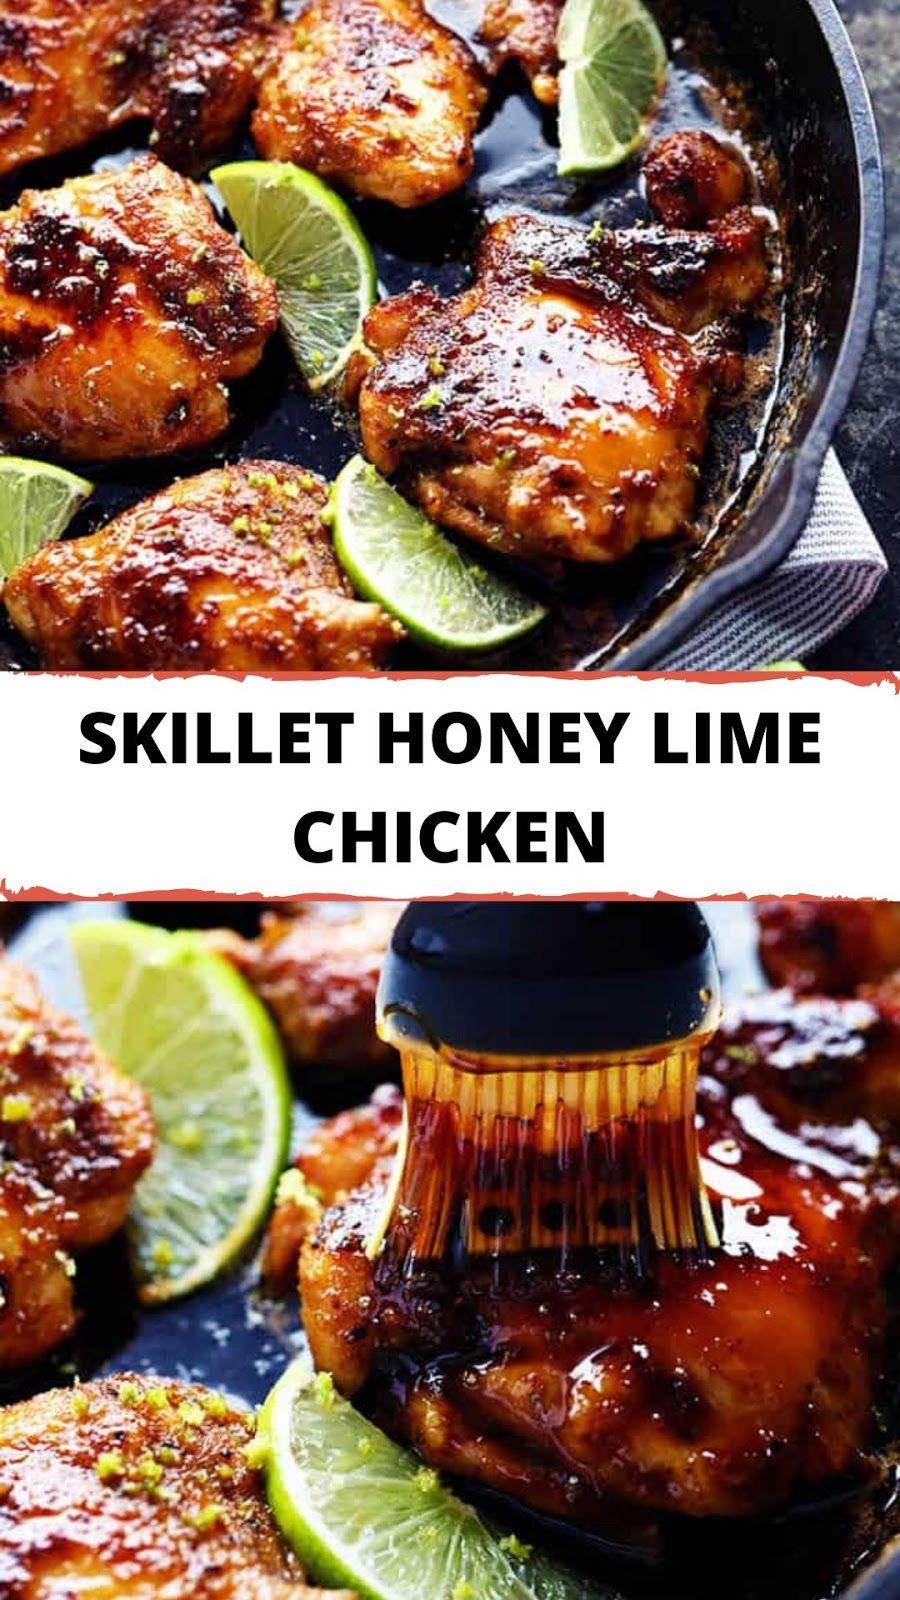 SKILLET HONEY LIME CHICKEN #skinless #chicken #thighs #skillet #soy #sauce